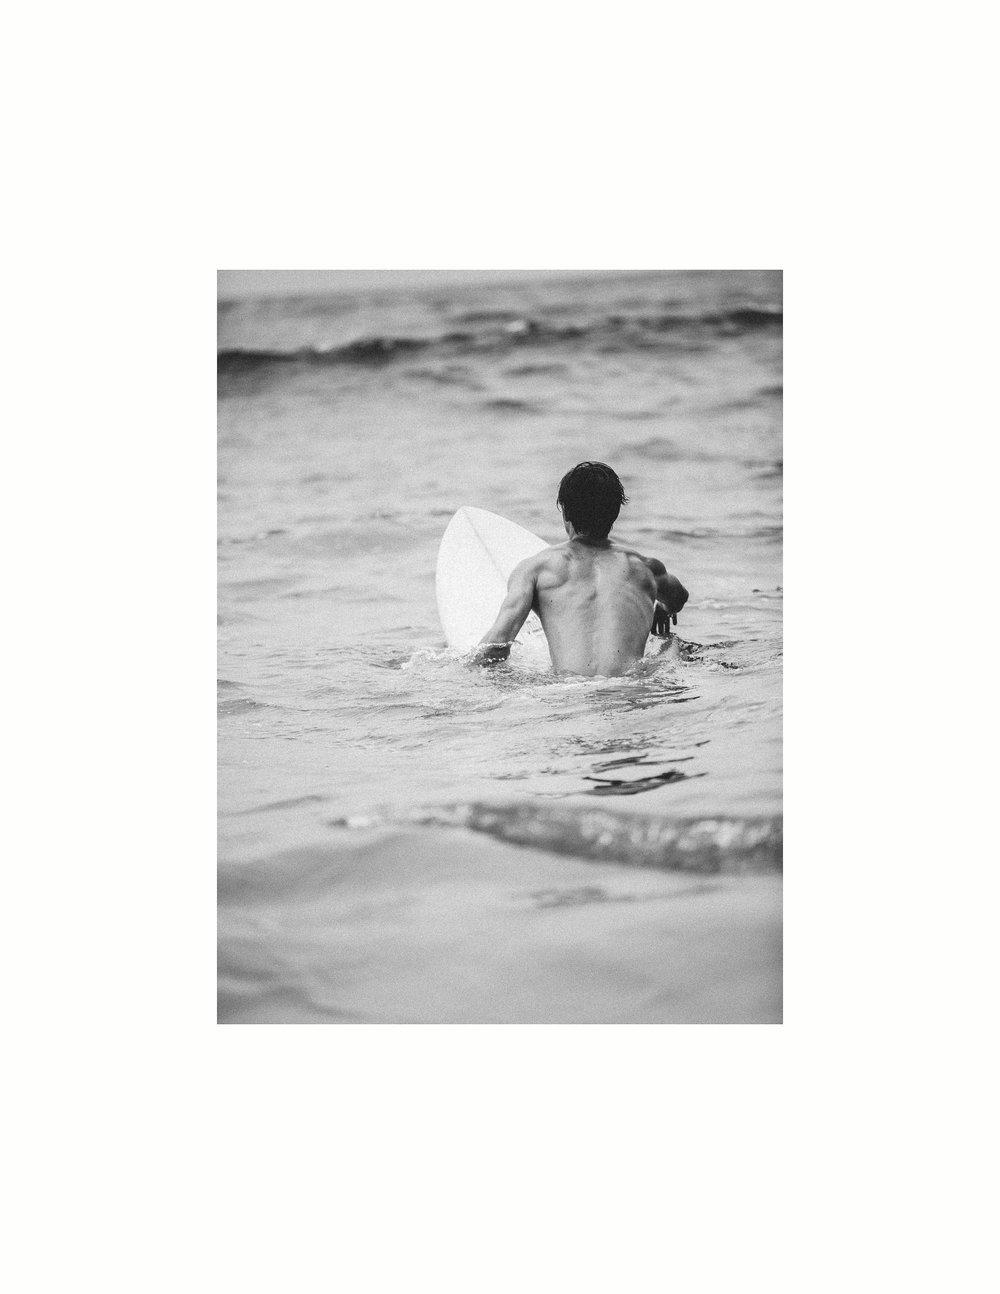 MM SURF-3.jpg